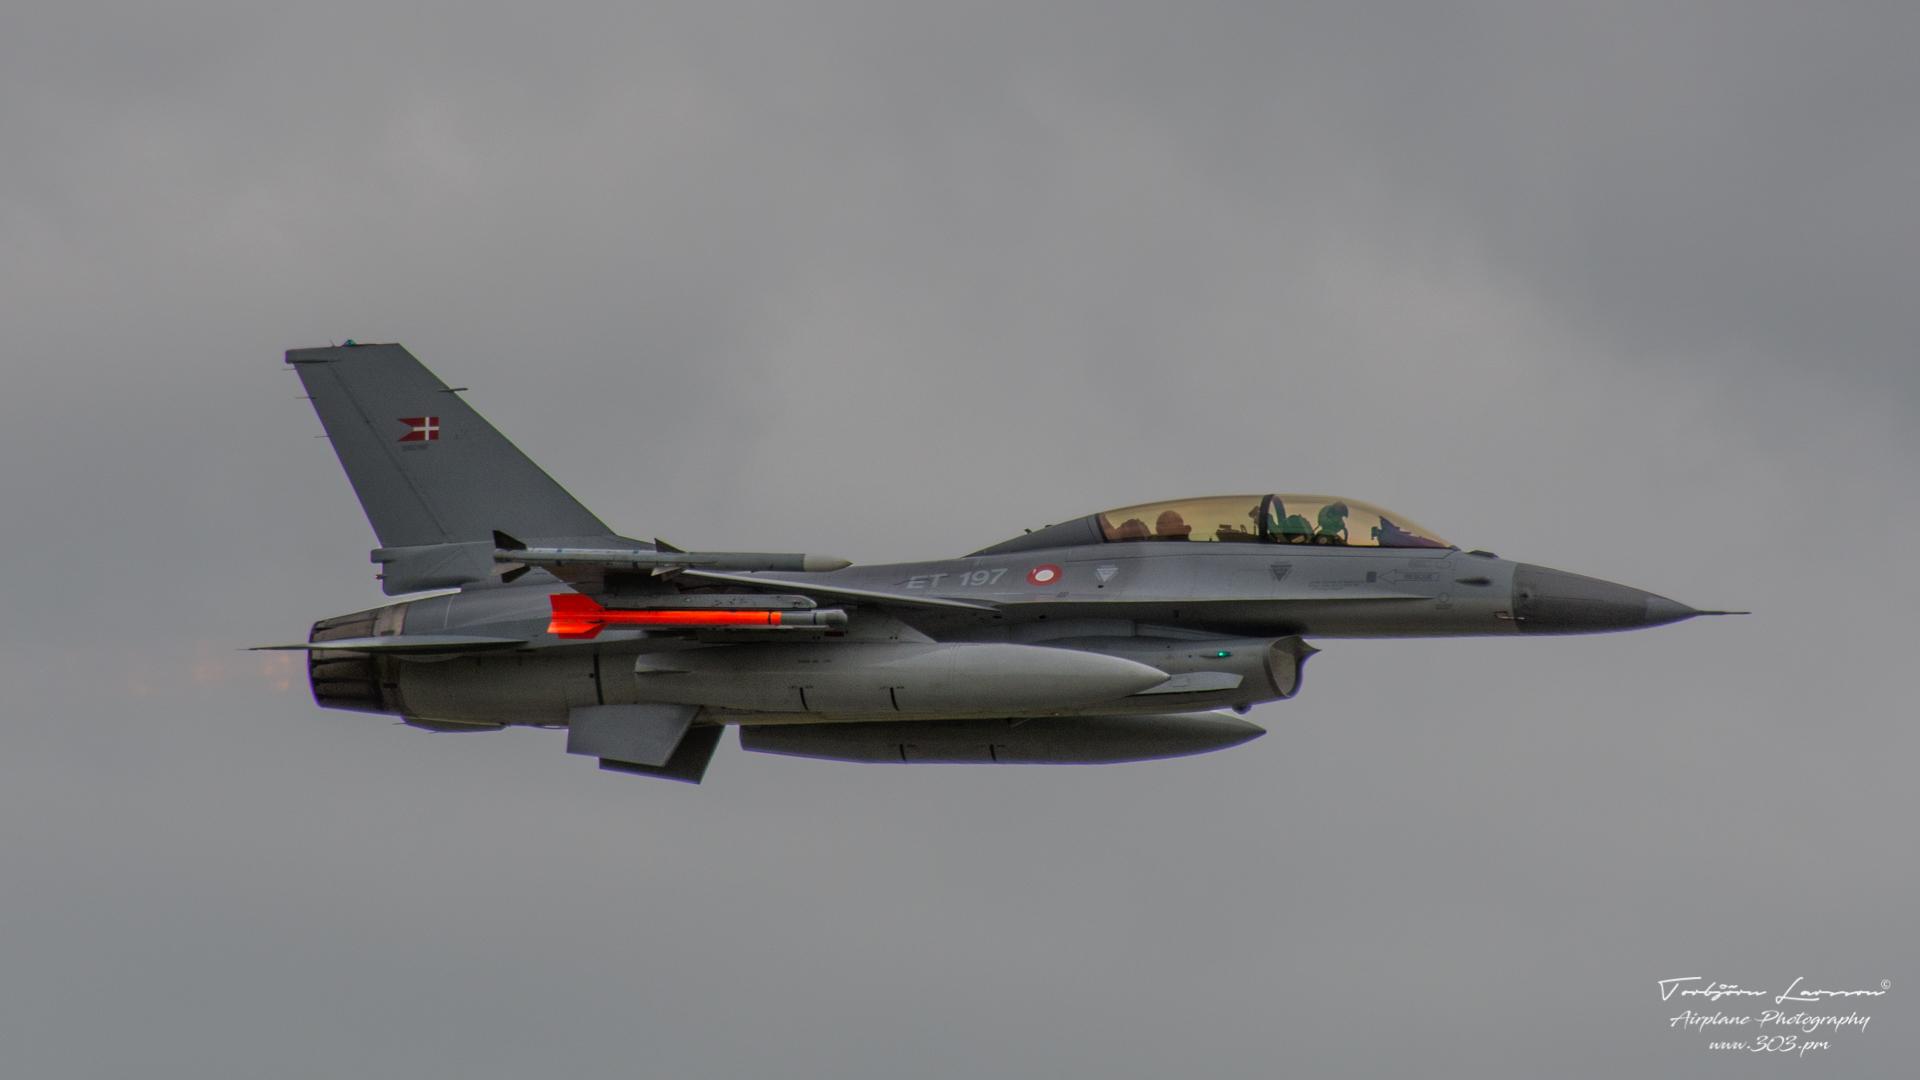 General Dynamics F-16 Fighting Falcon - Danish Air Force